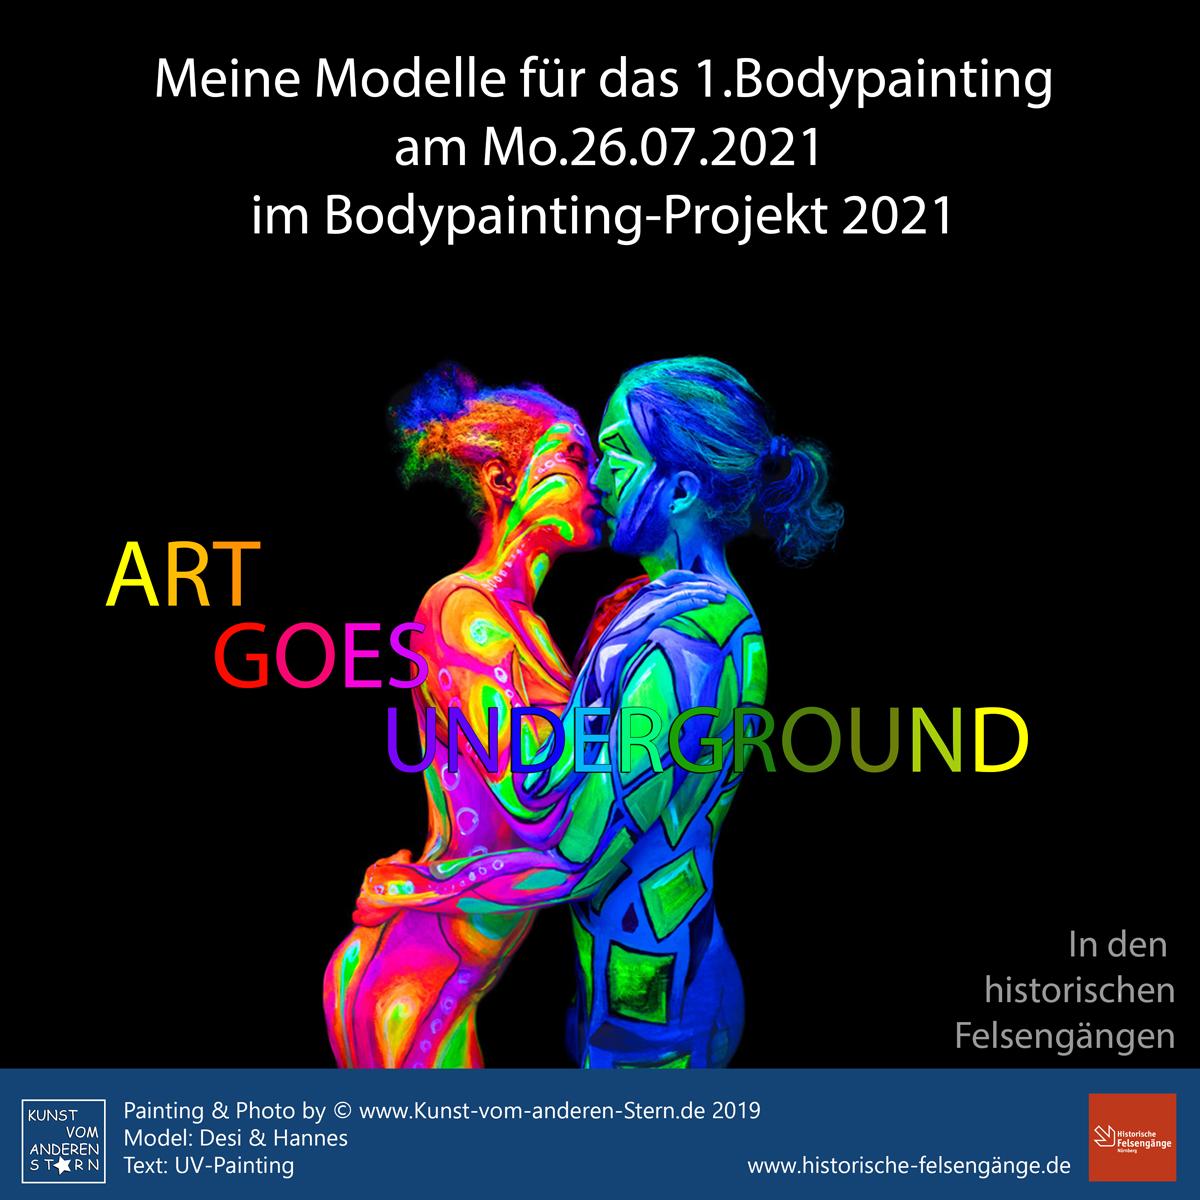 Bodypainting-Projekt 2021 – Art goes Underground – Modelle 1. Event